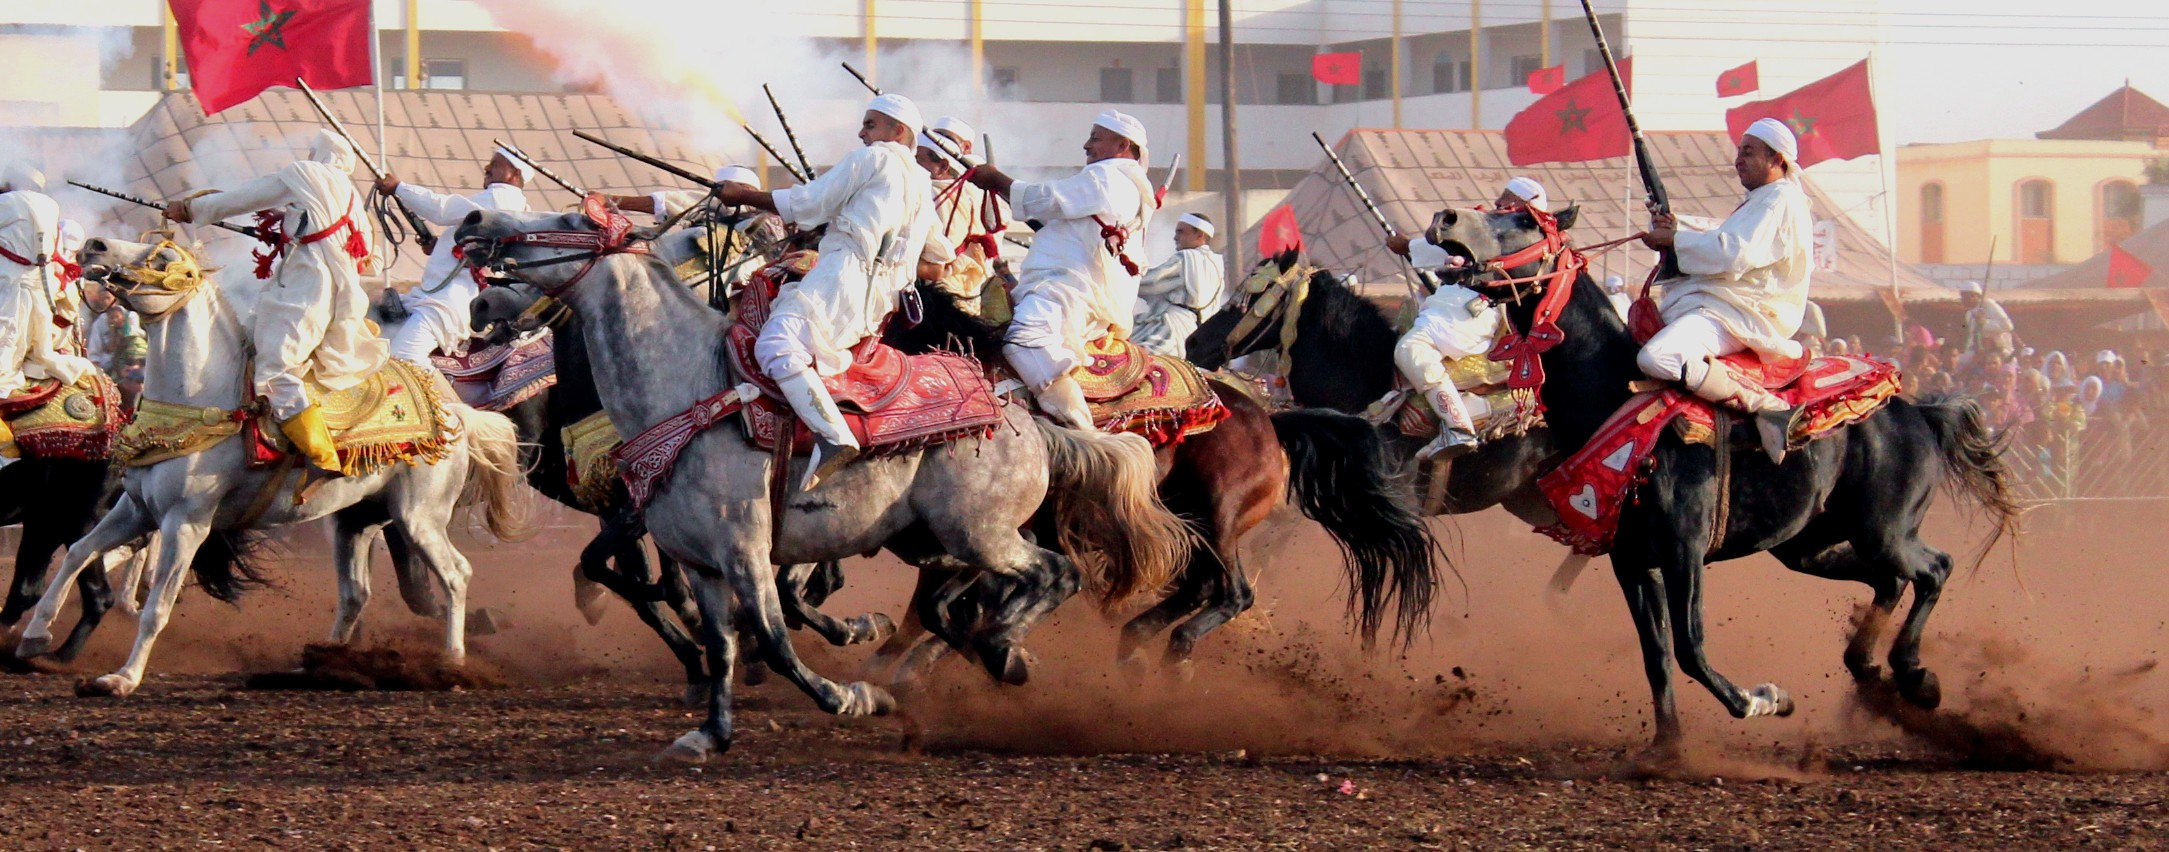 morocco-fantasia1532121807